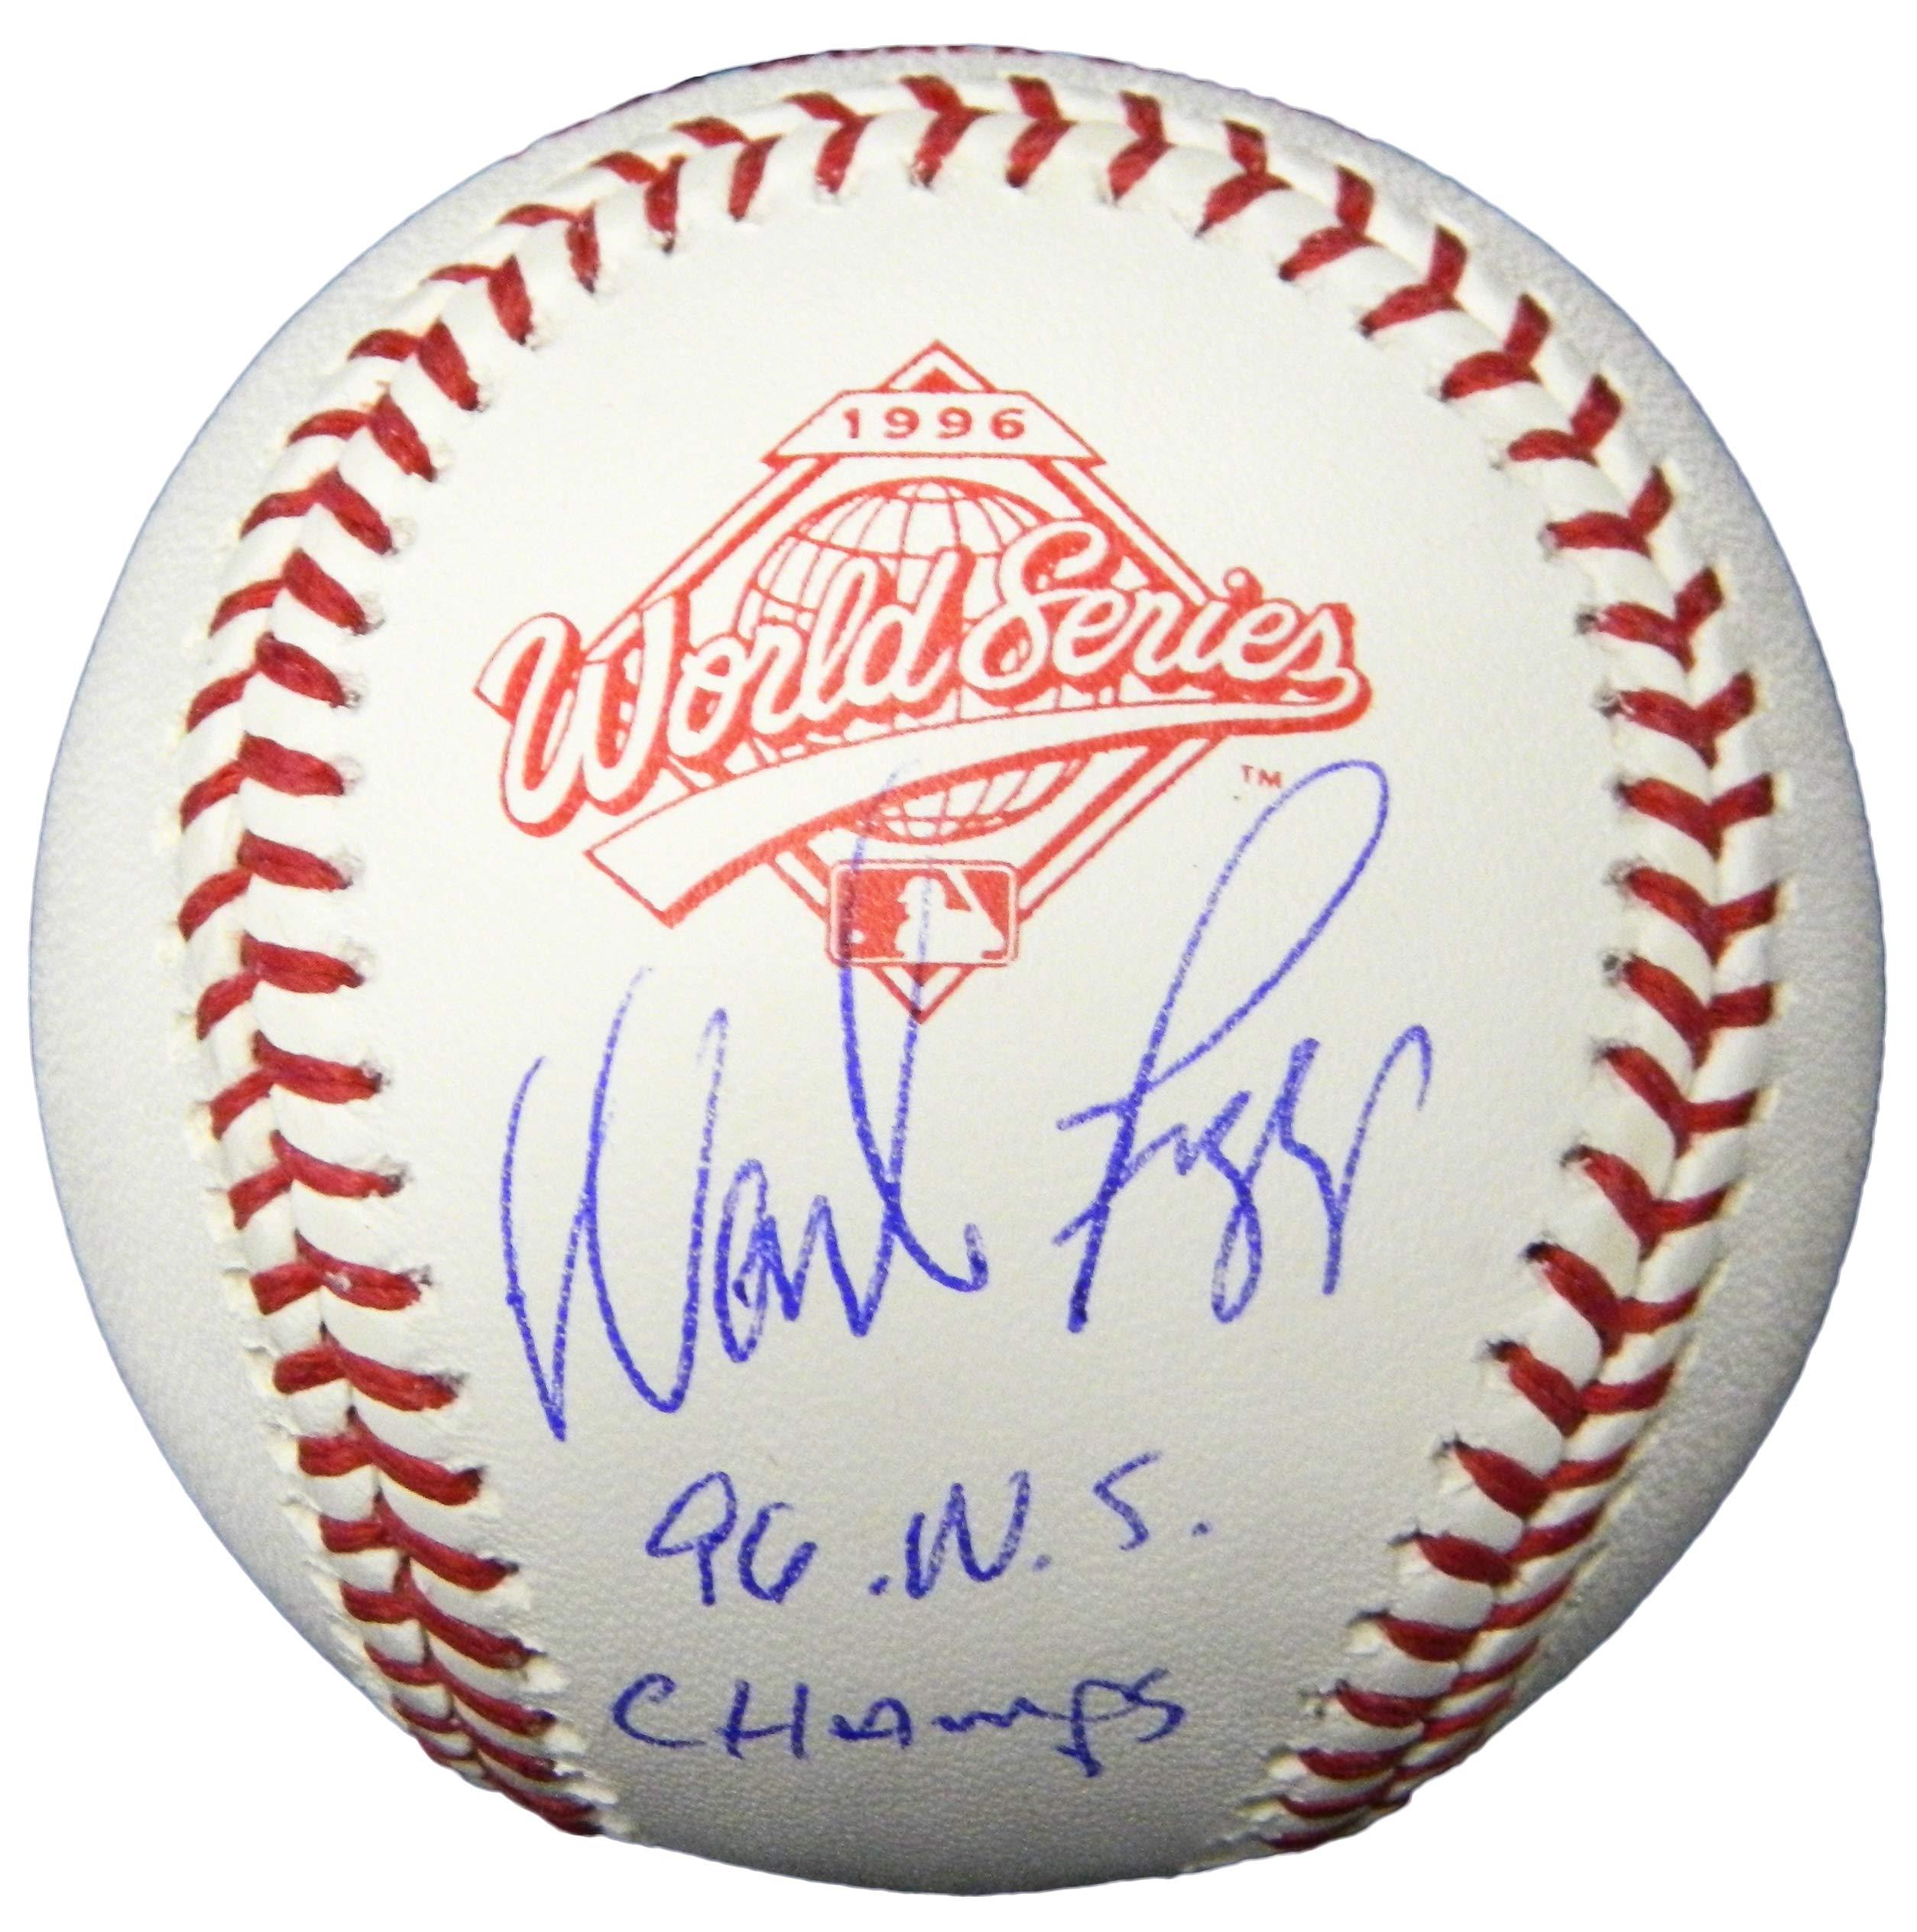 Wade Boggs Signed Rawlings 1996 World Series (New York Yankees) Baseball w/96 WS Champs